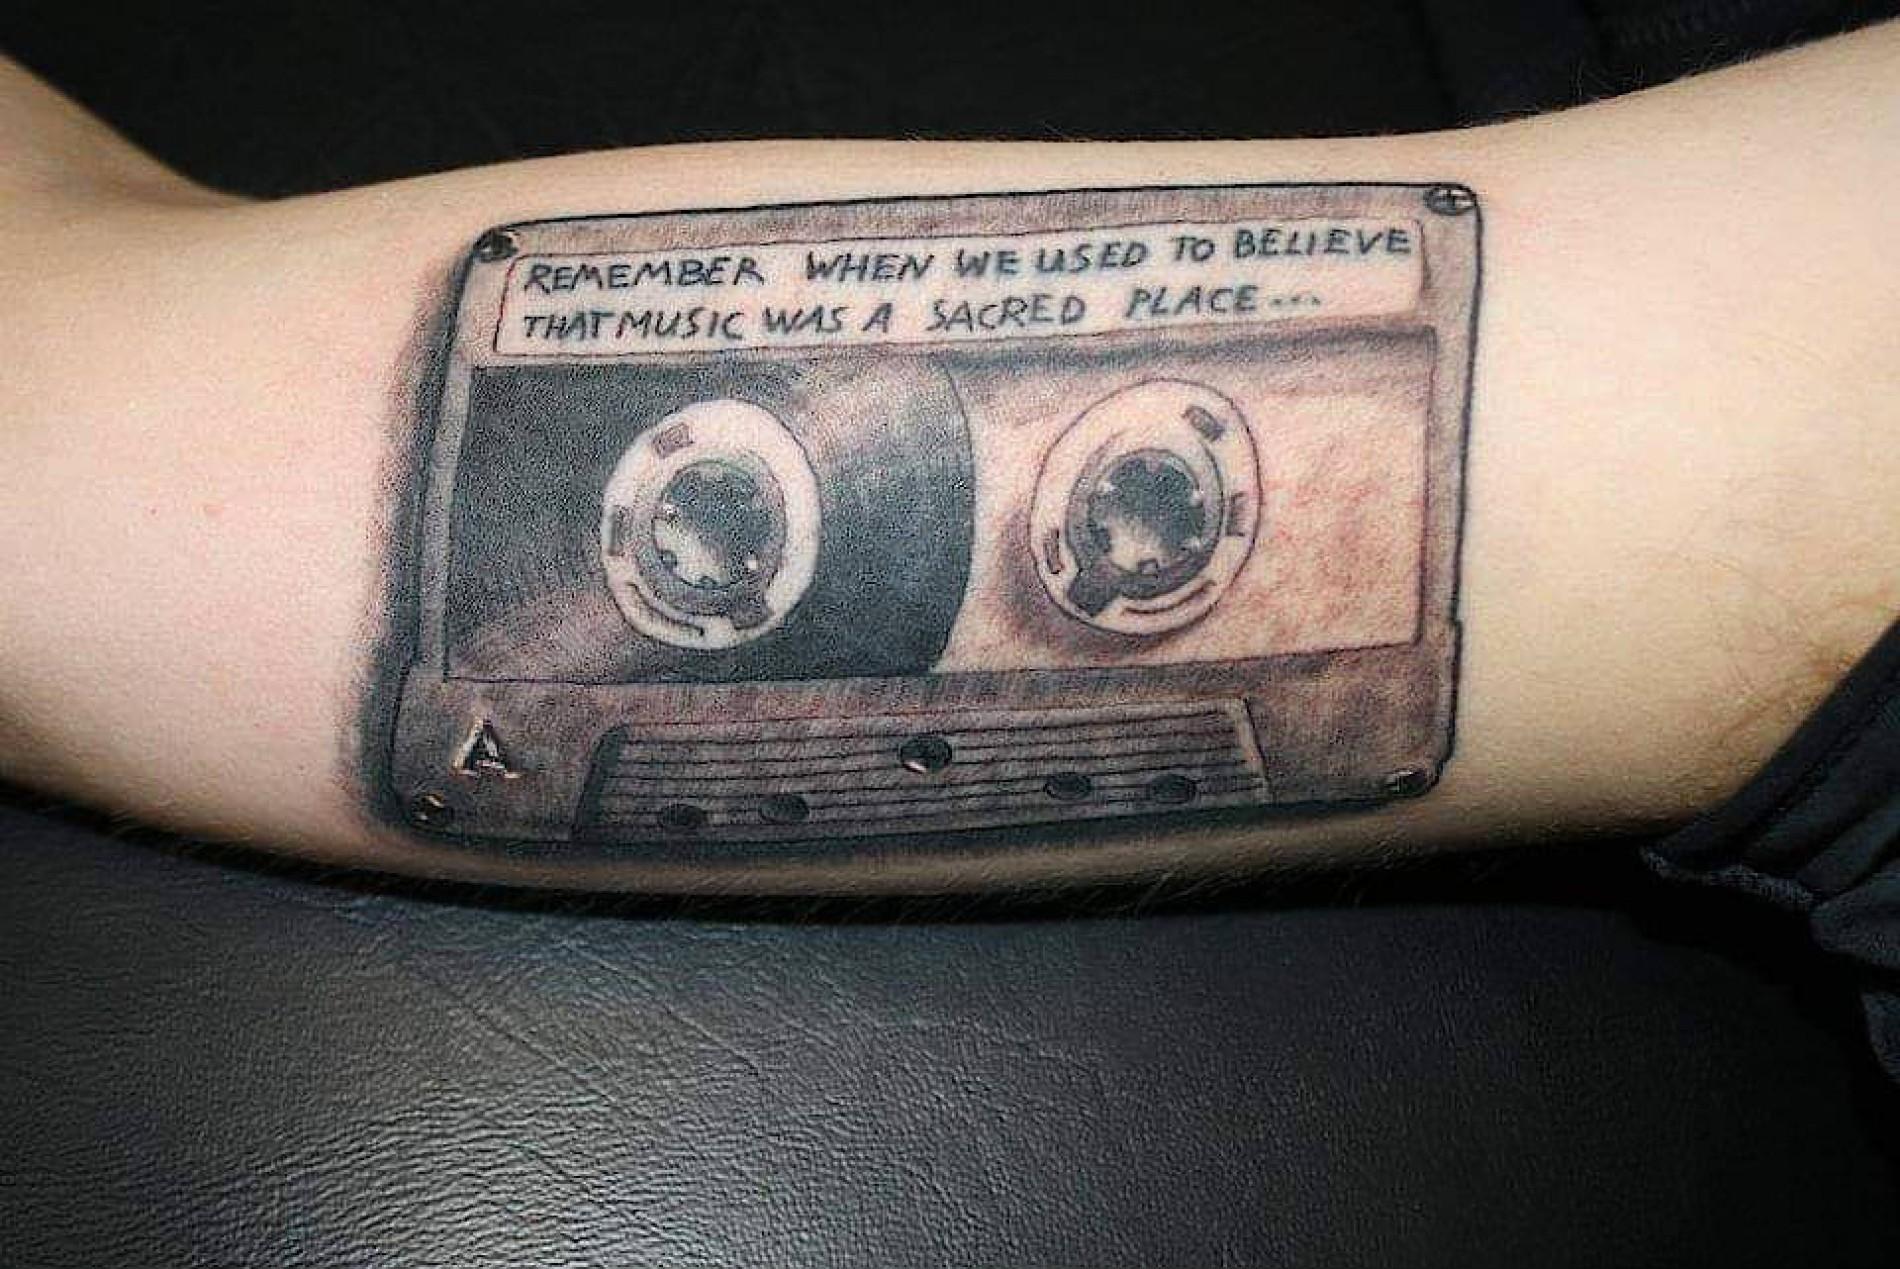 Schmerzen tattoo hals frau Tattoo stechen: